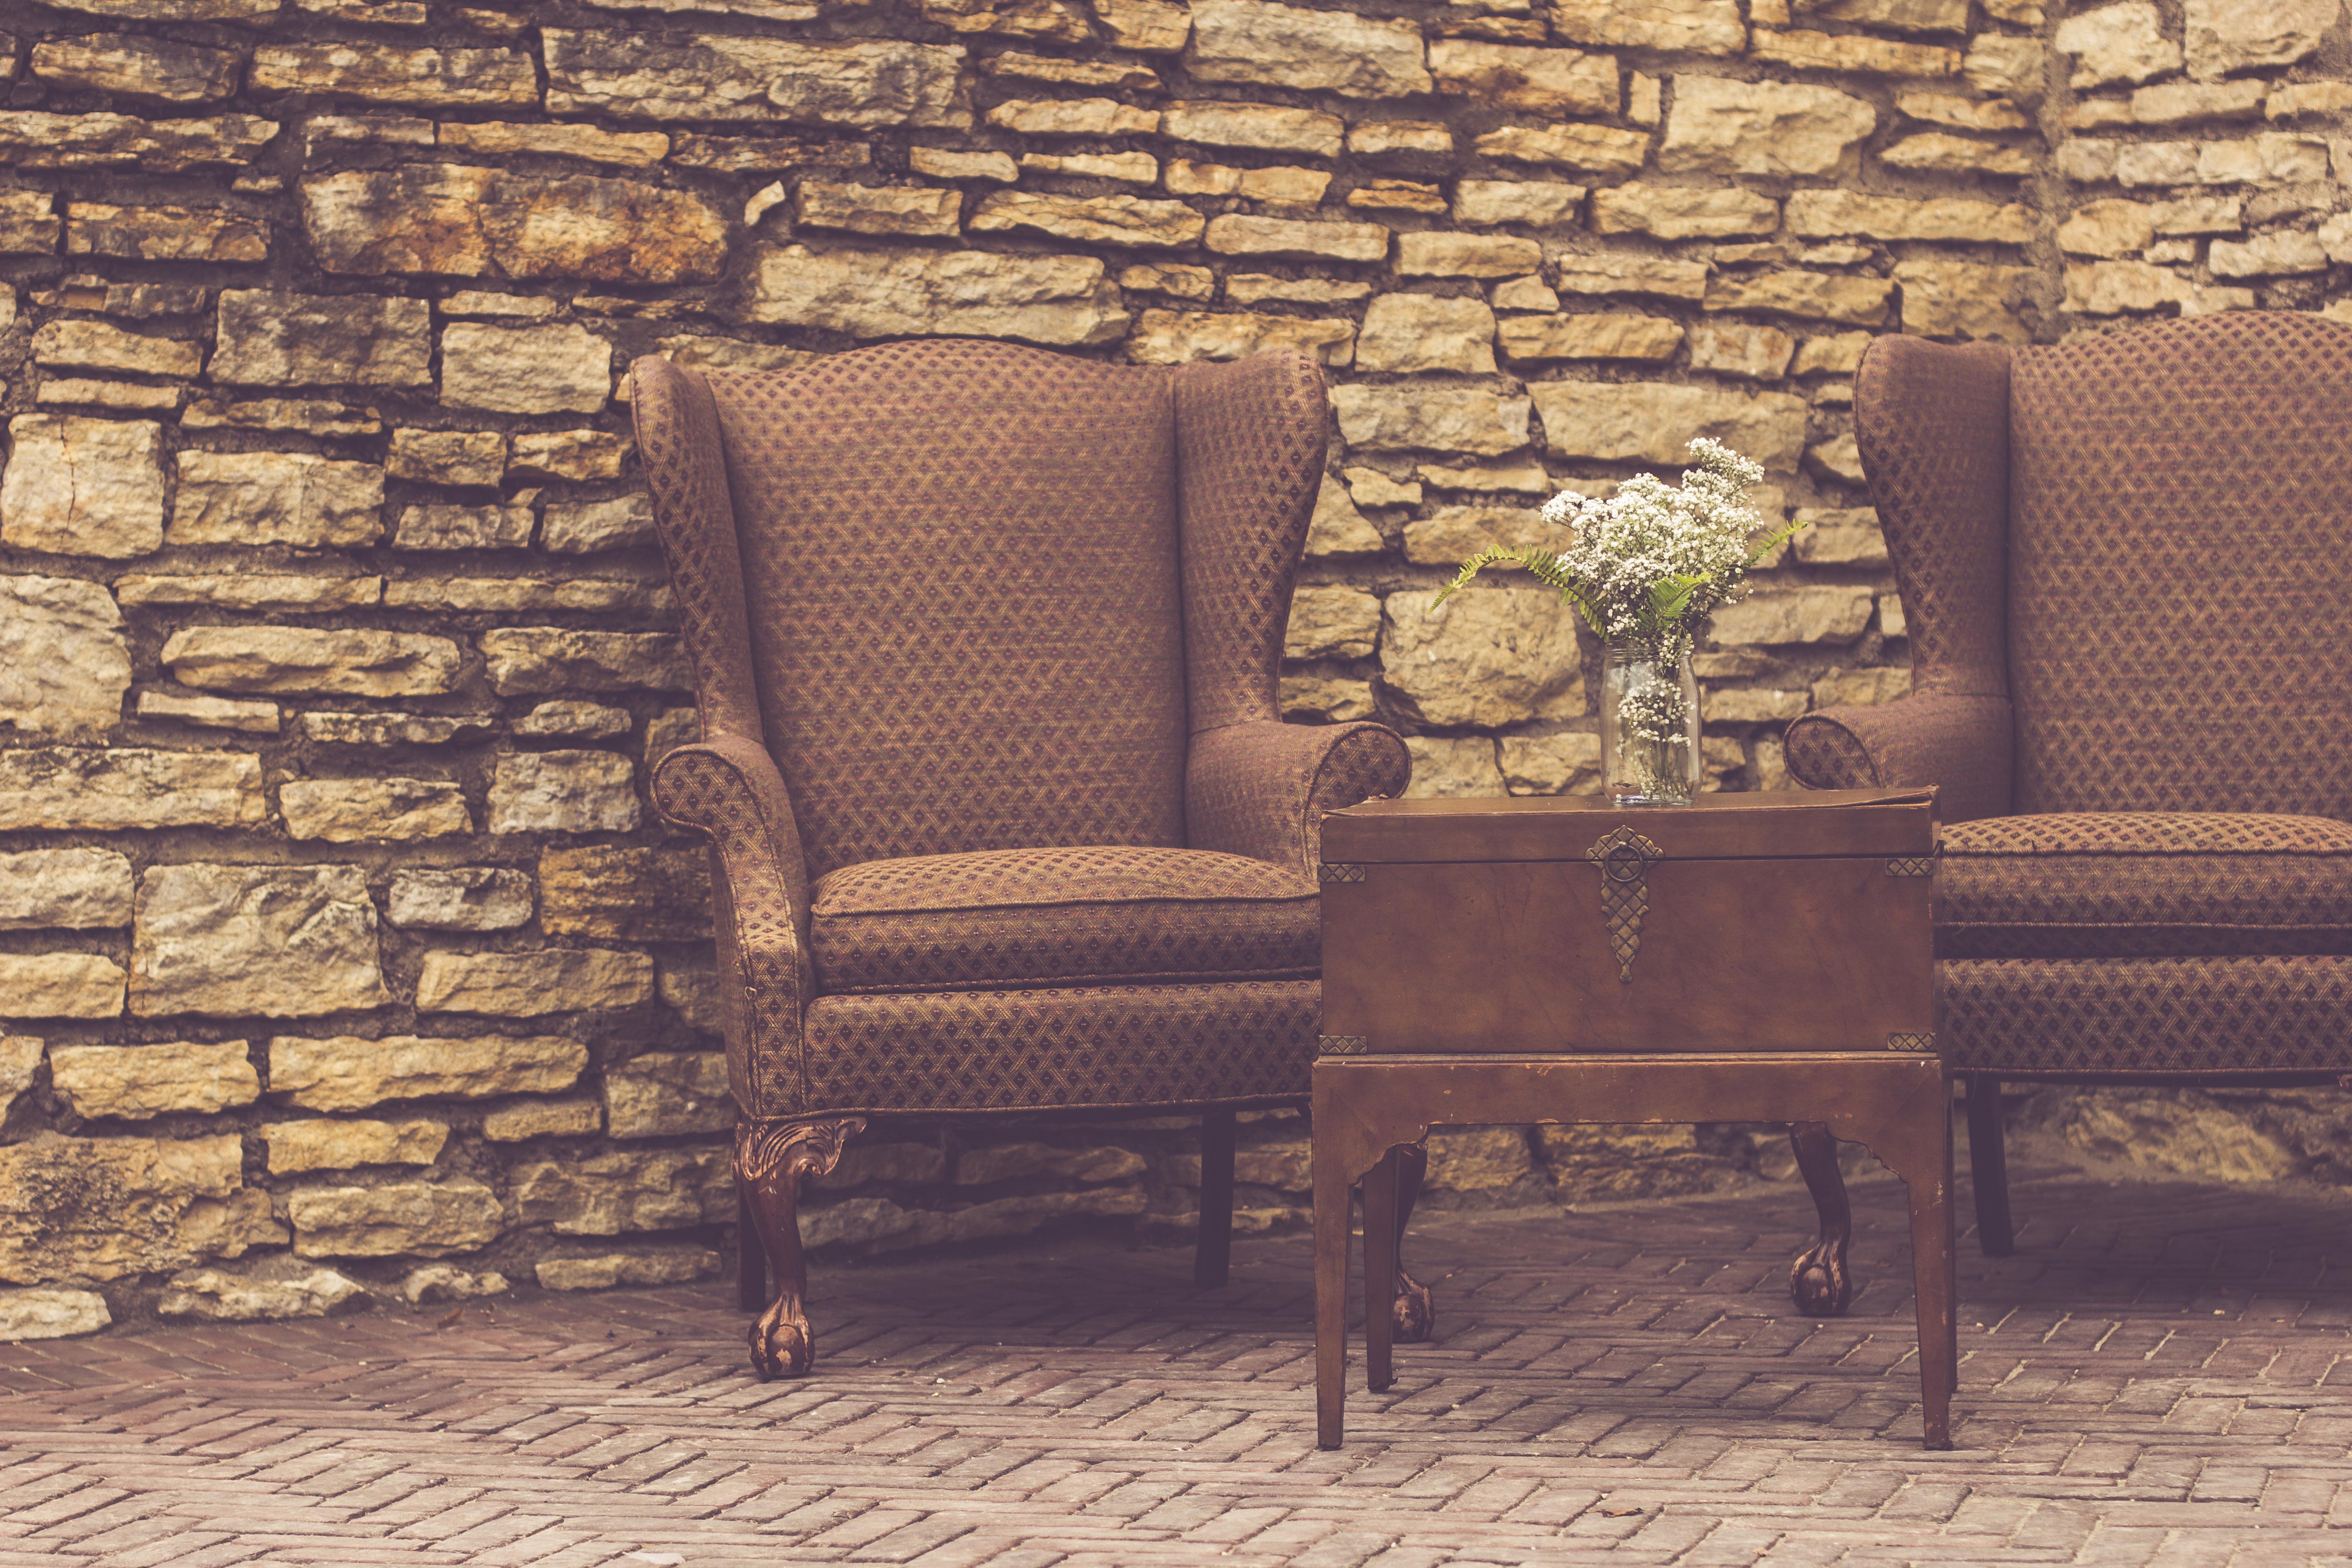 Furniture Flip: How to Refurbish & Restore Old Furniture